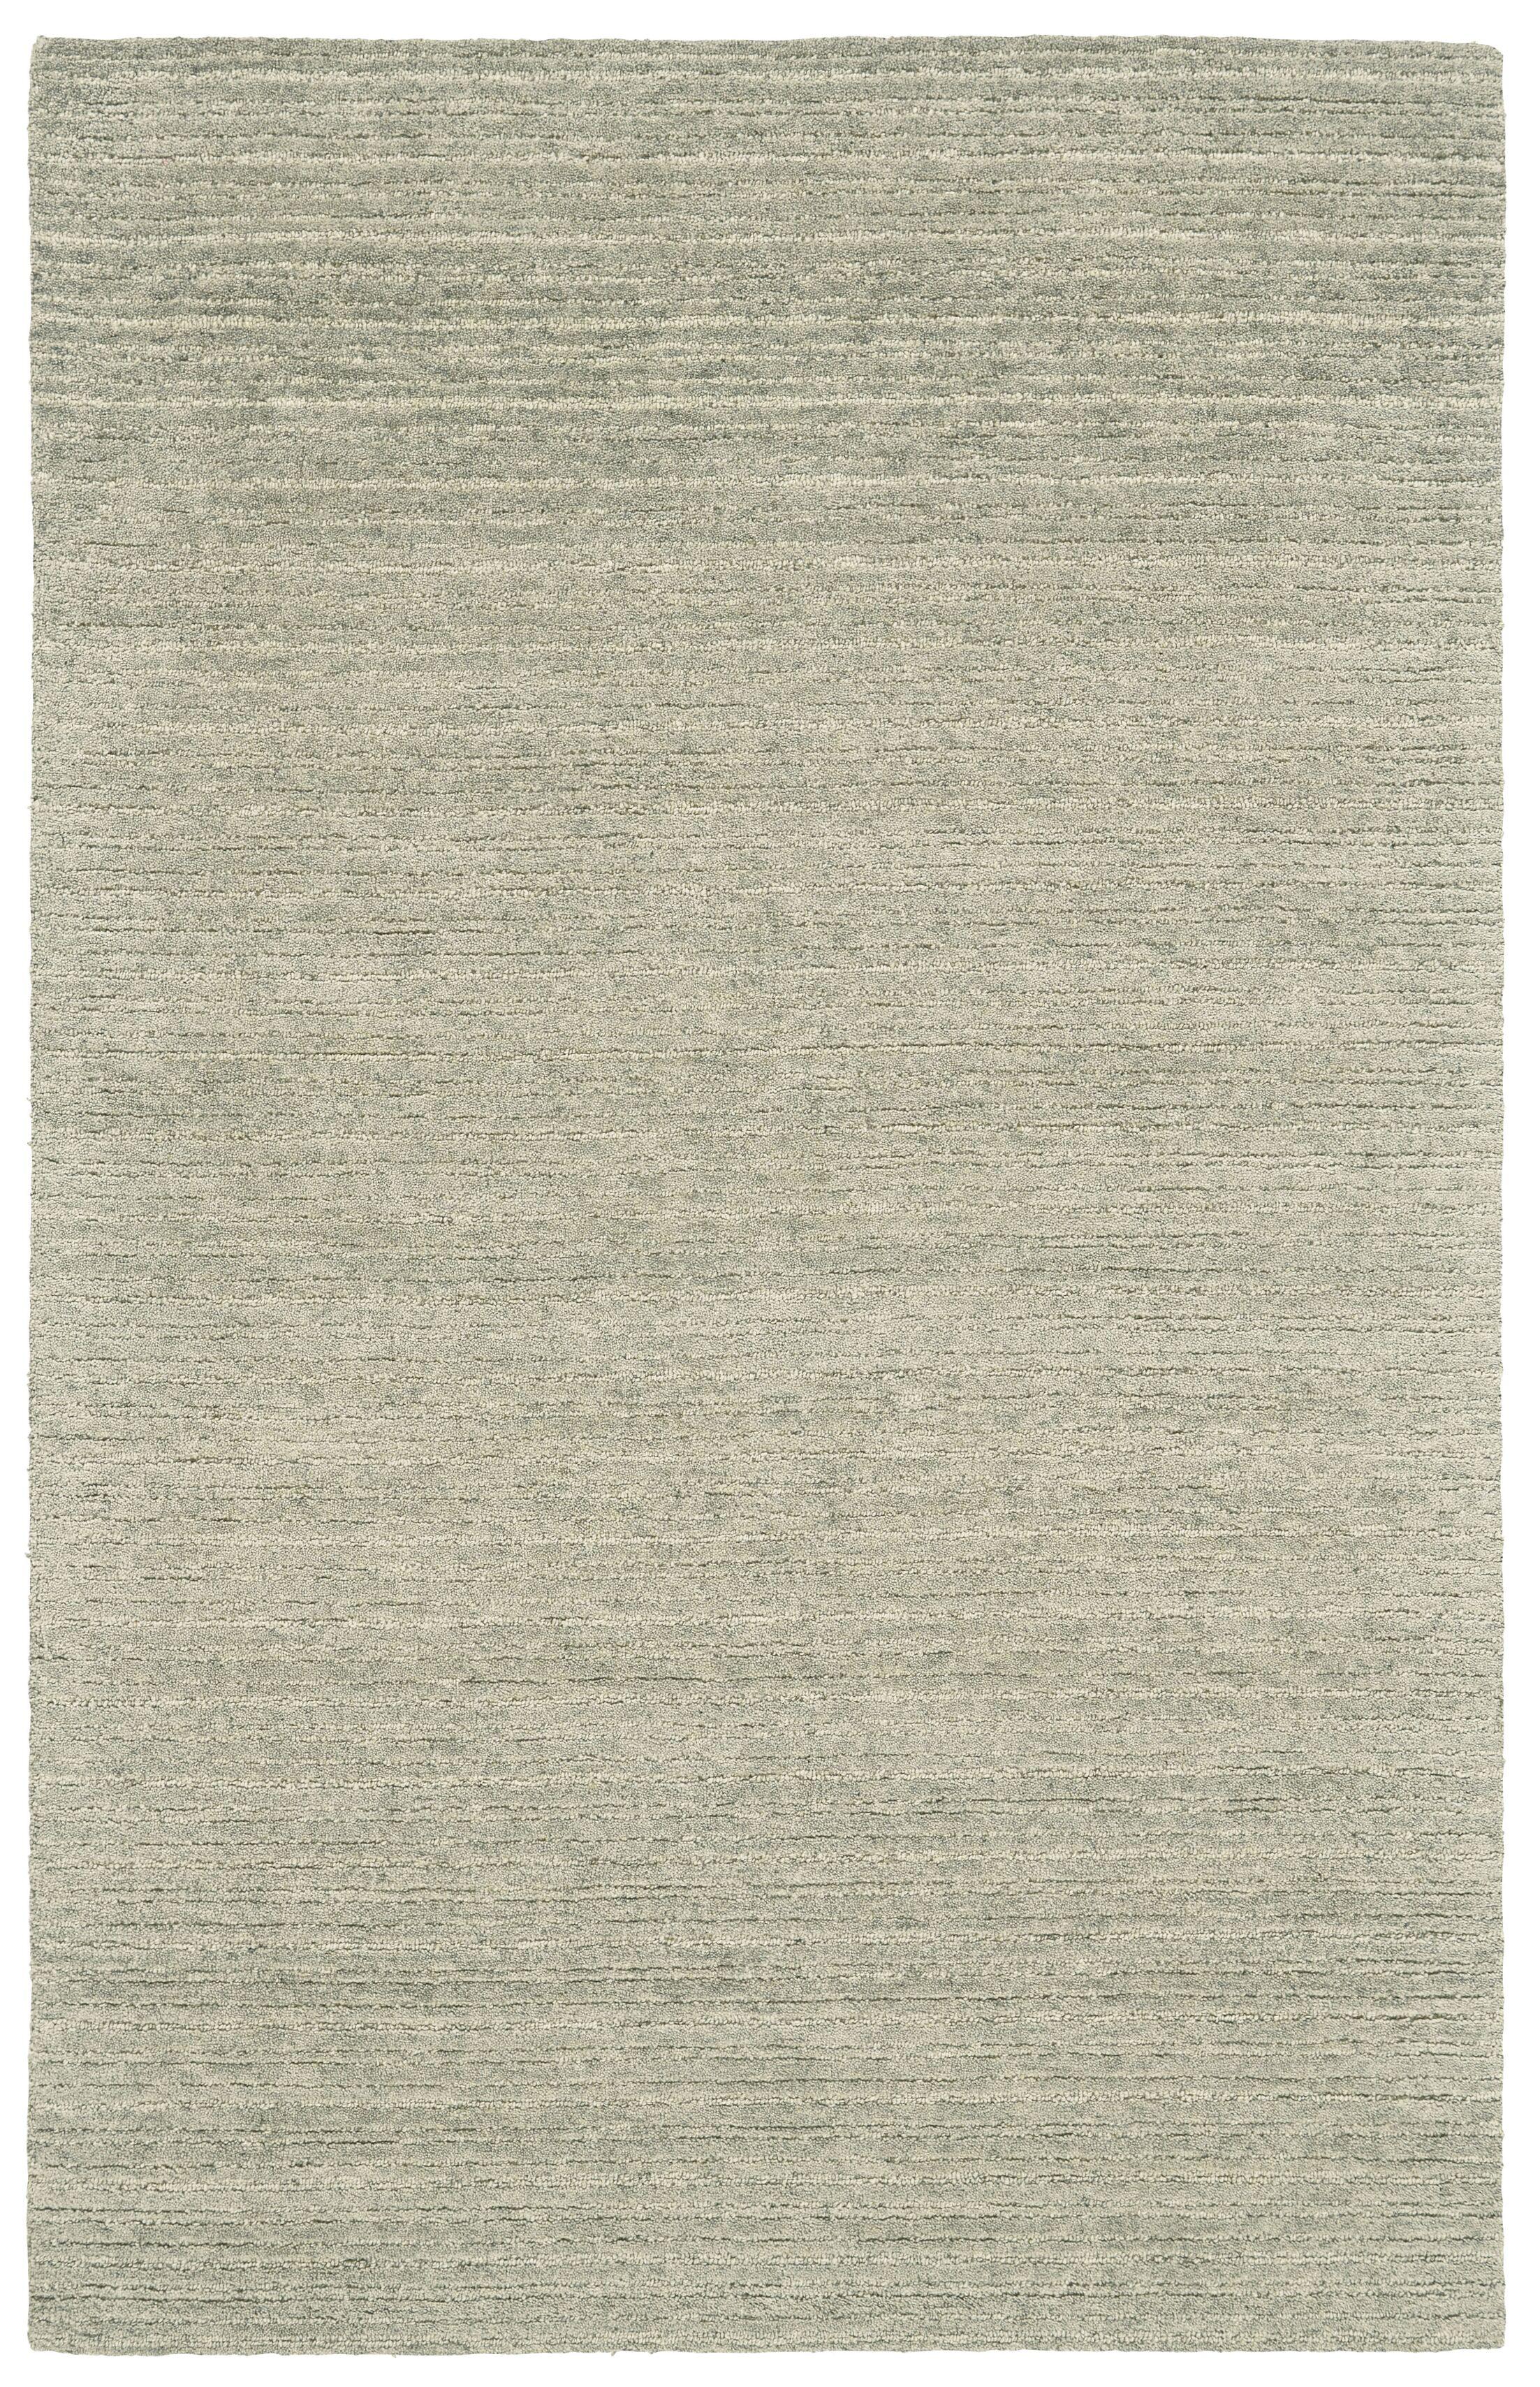 Glenn Hand-Tufted Smoke Area Rug Rug Size: Rectangle 5' x 8'